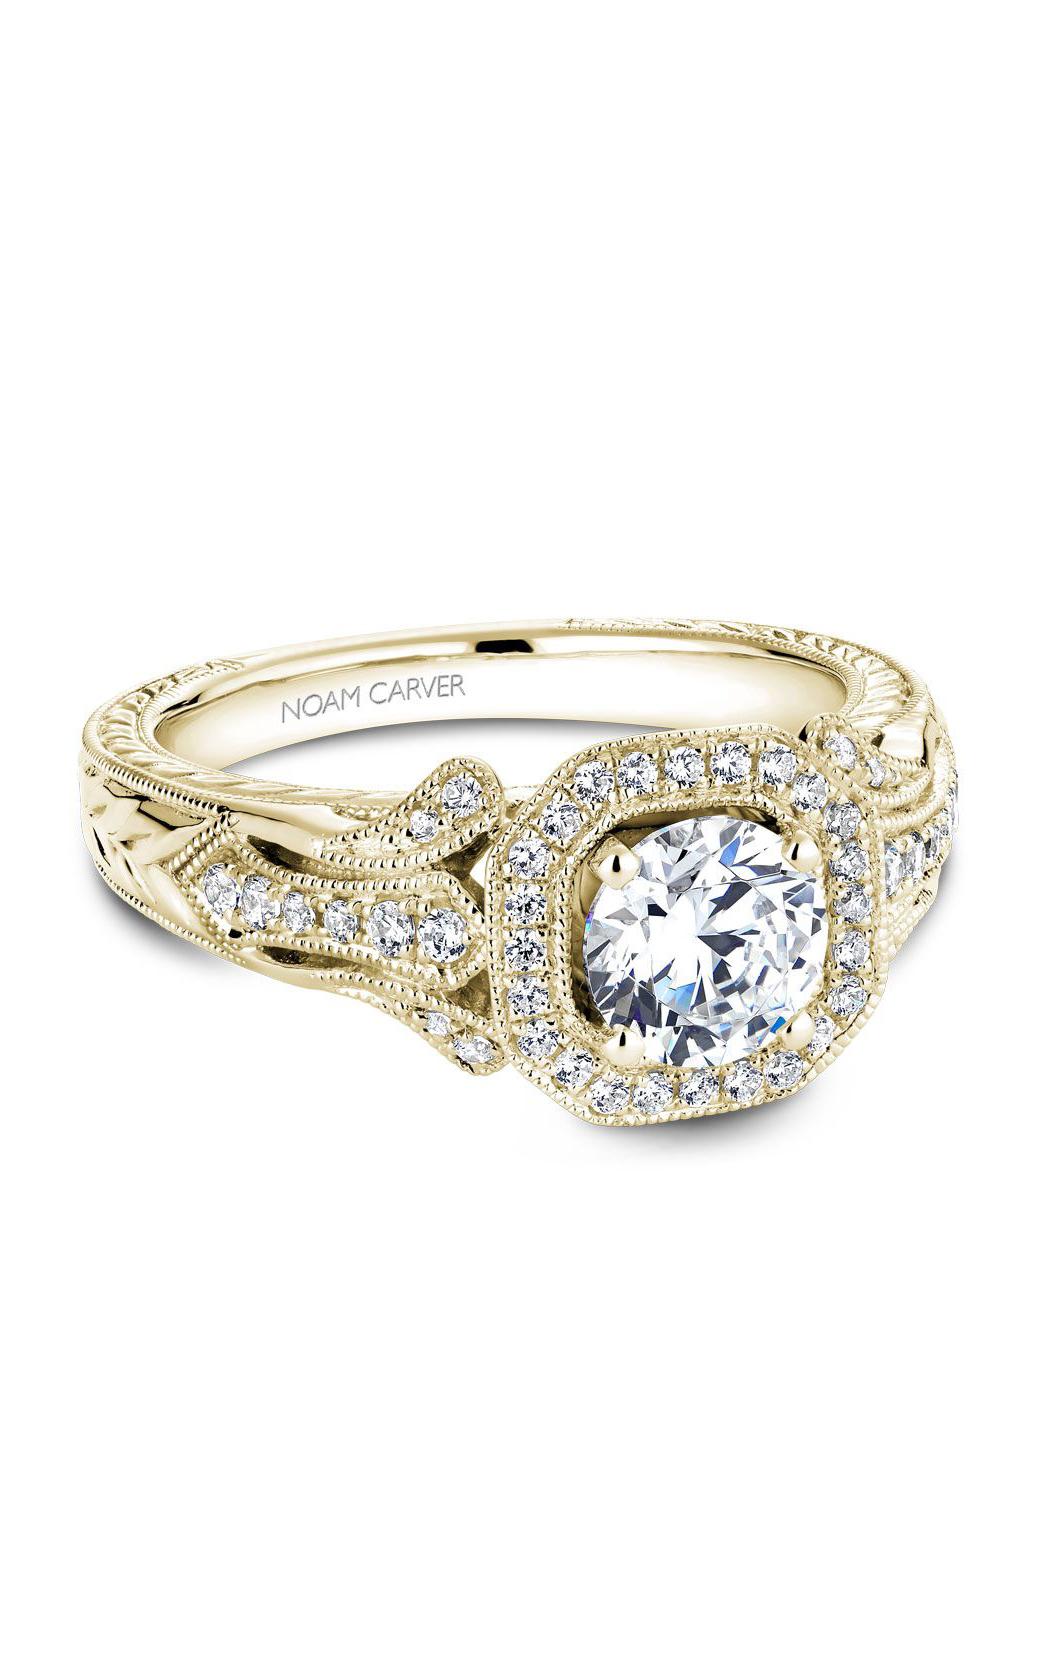 Noam Carver Vintage Engagement Ring B079-01YM product image